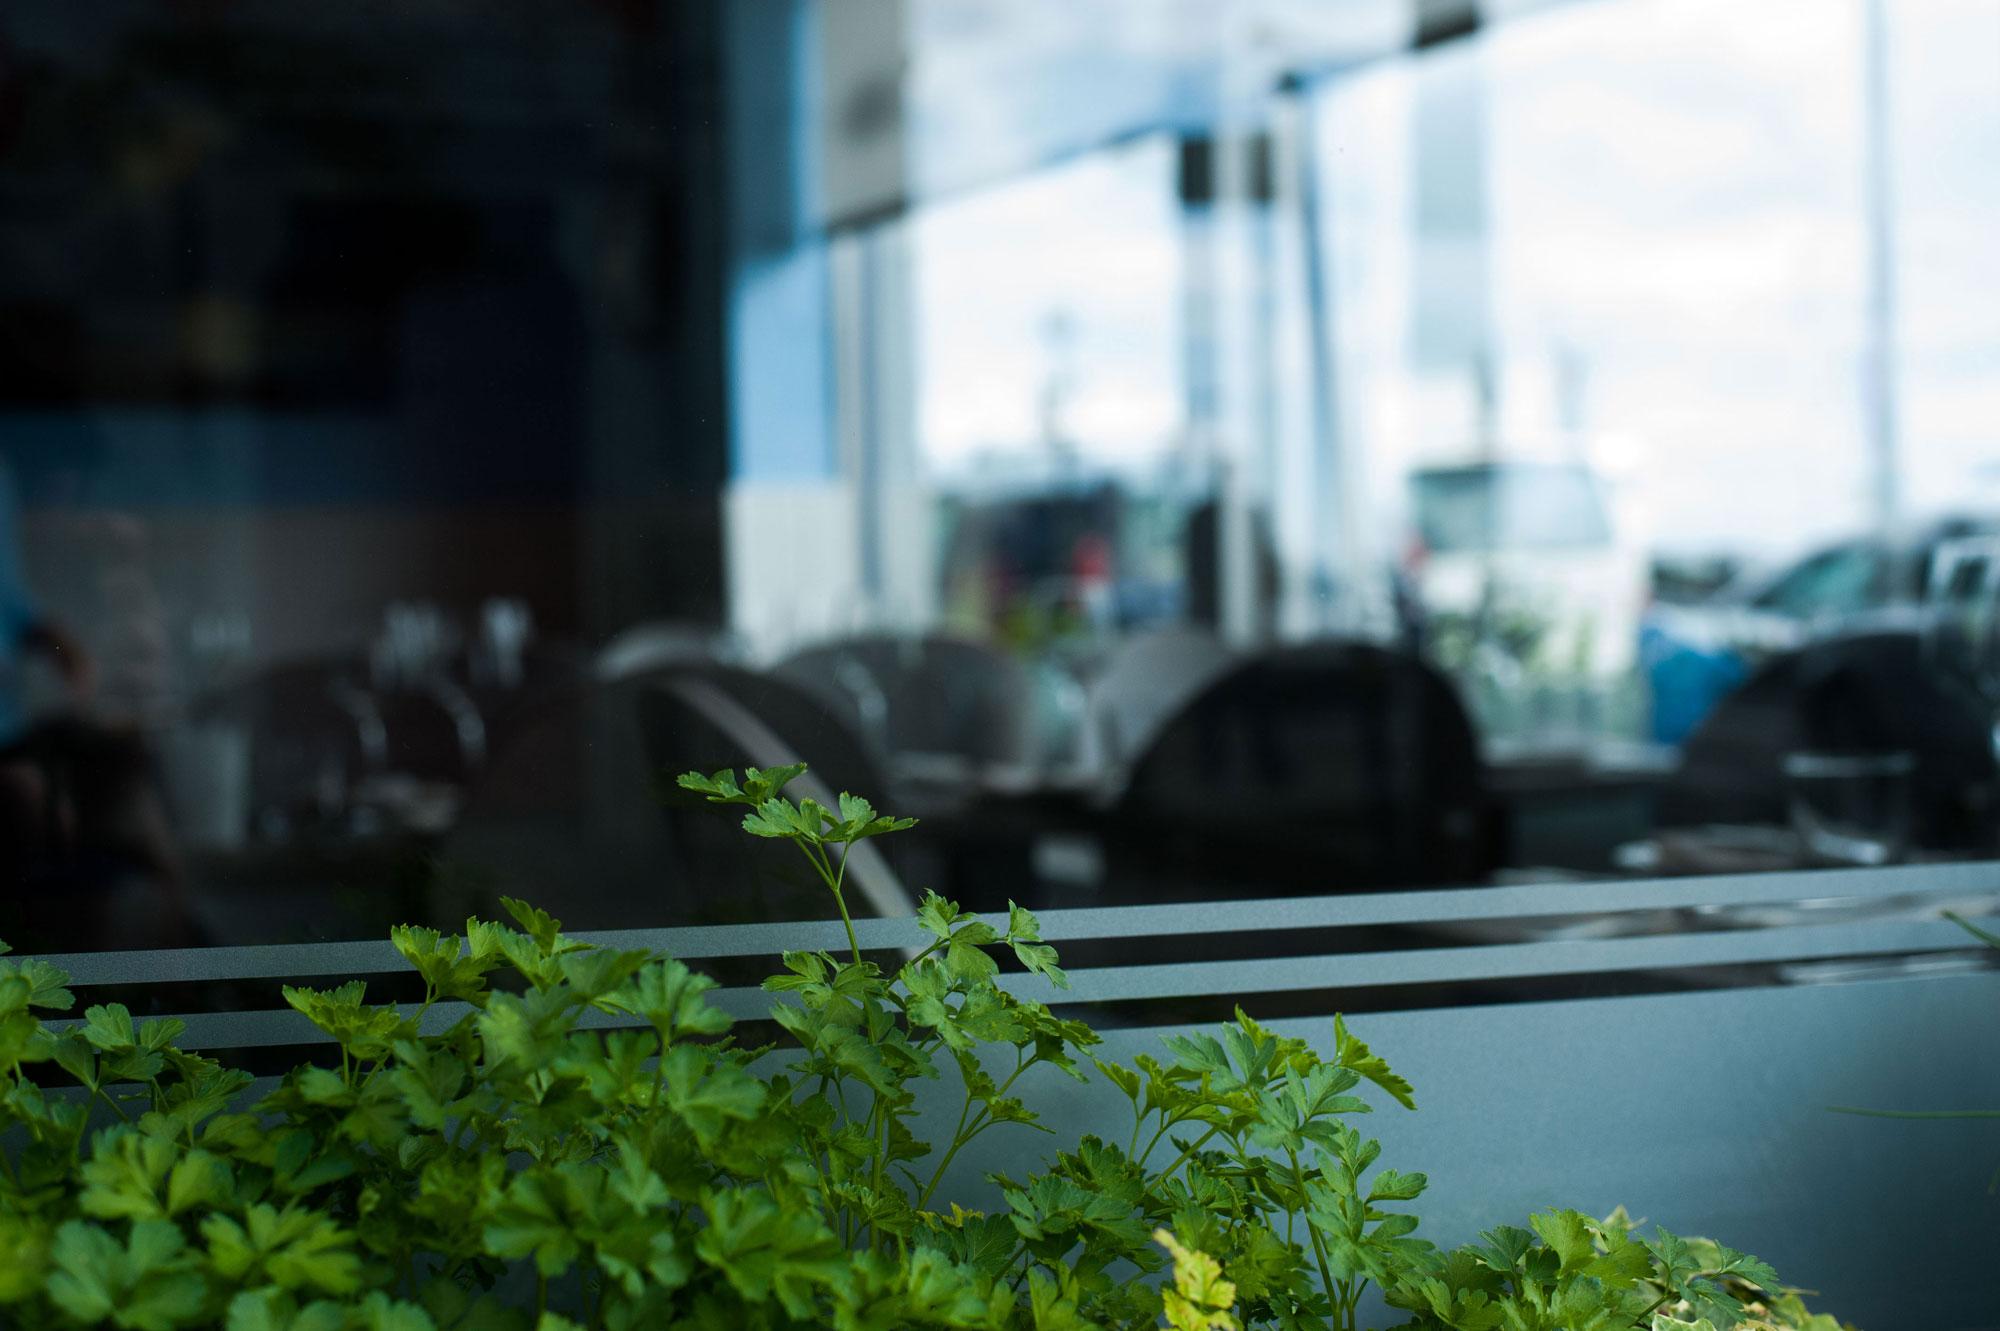 la cote window wexford